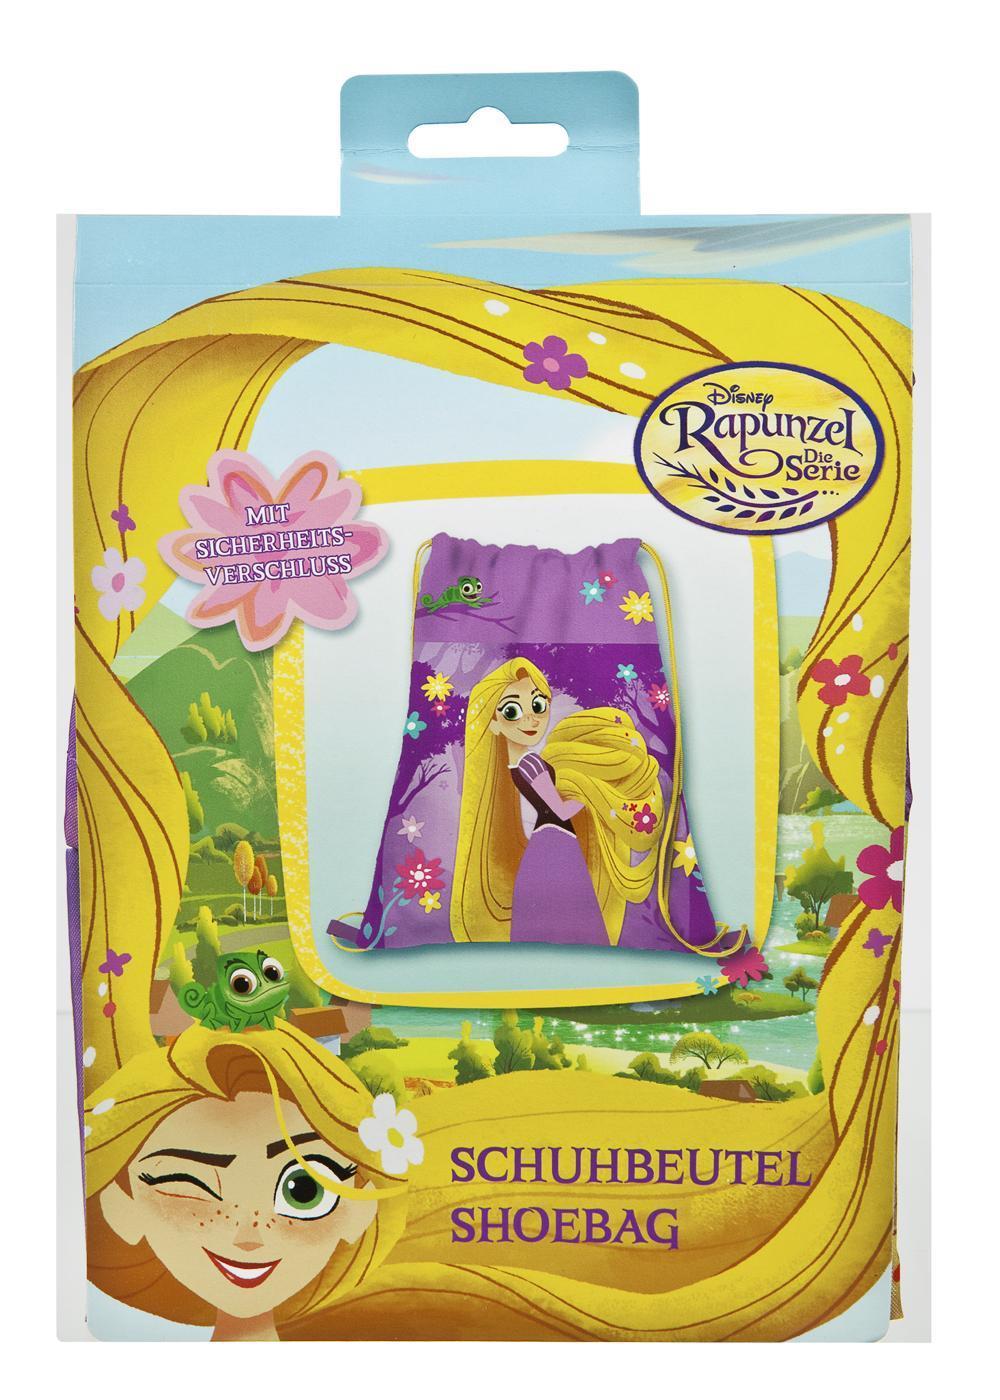 Rapunzel Sportbeutel